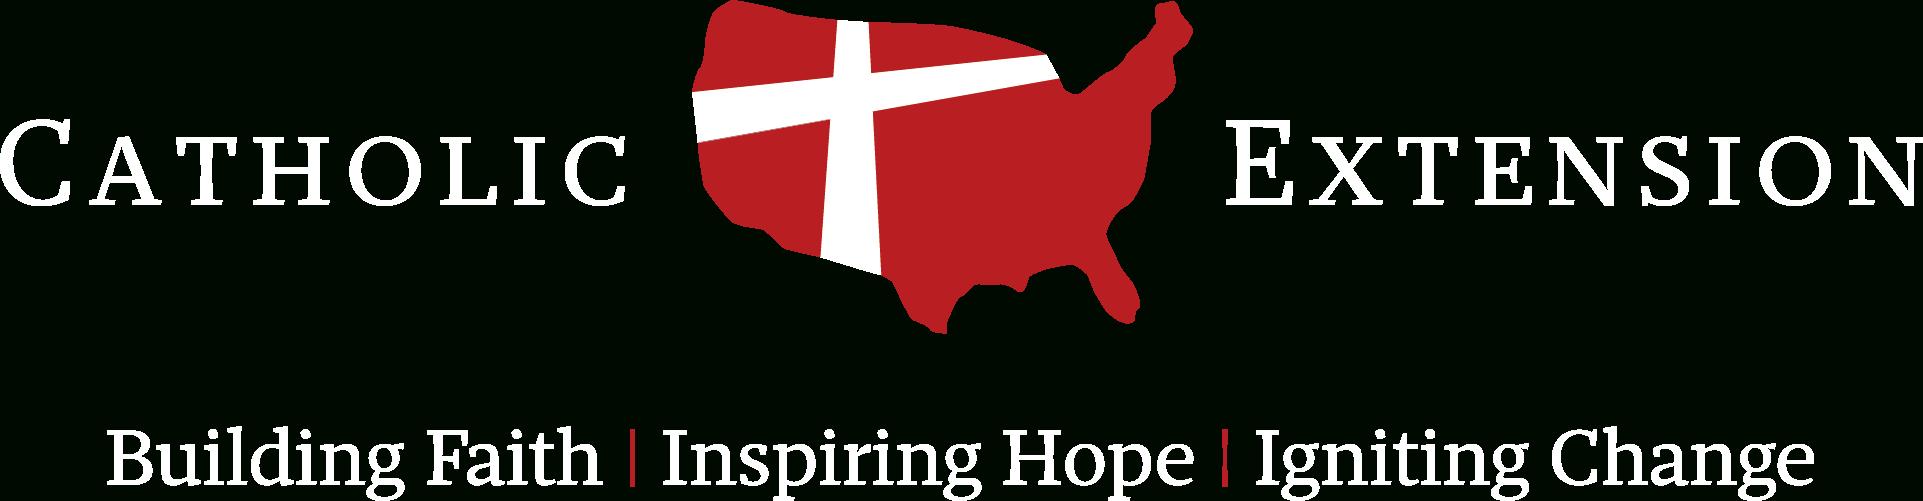 Catholic Extension | Building Faith, Inspiring Hope intended for Catholic Extension Calendar